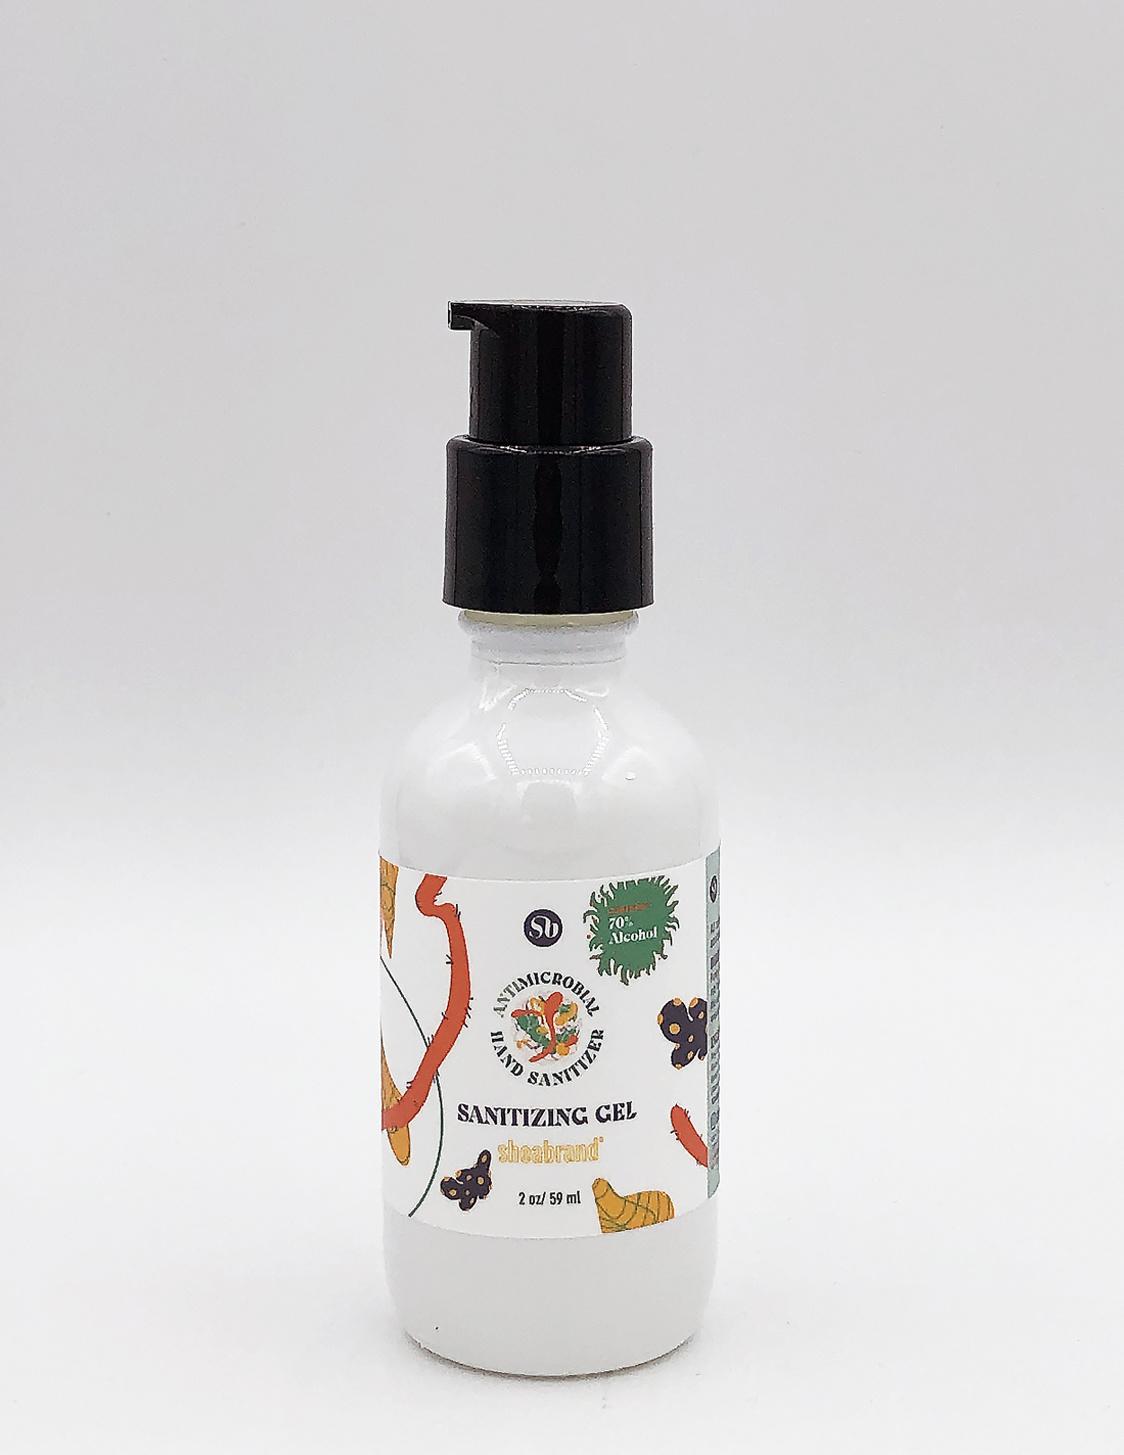 Shea Brand Hand Sanitizer Gel